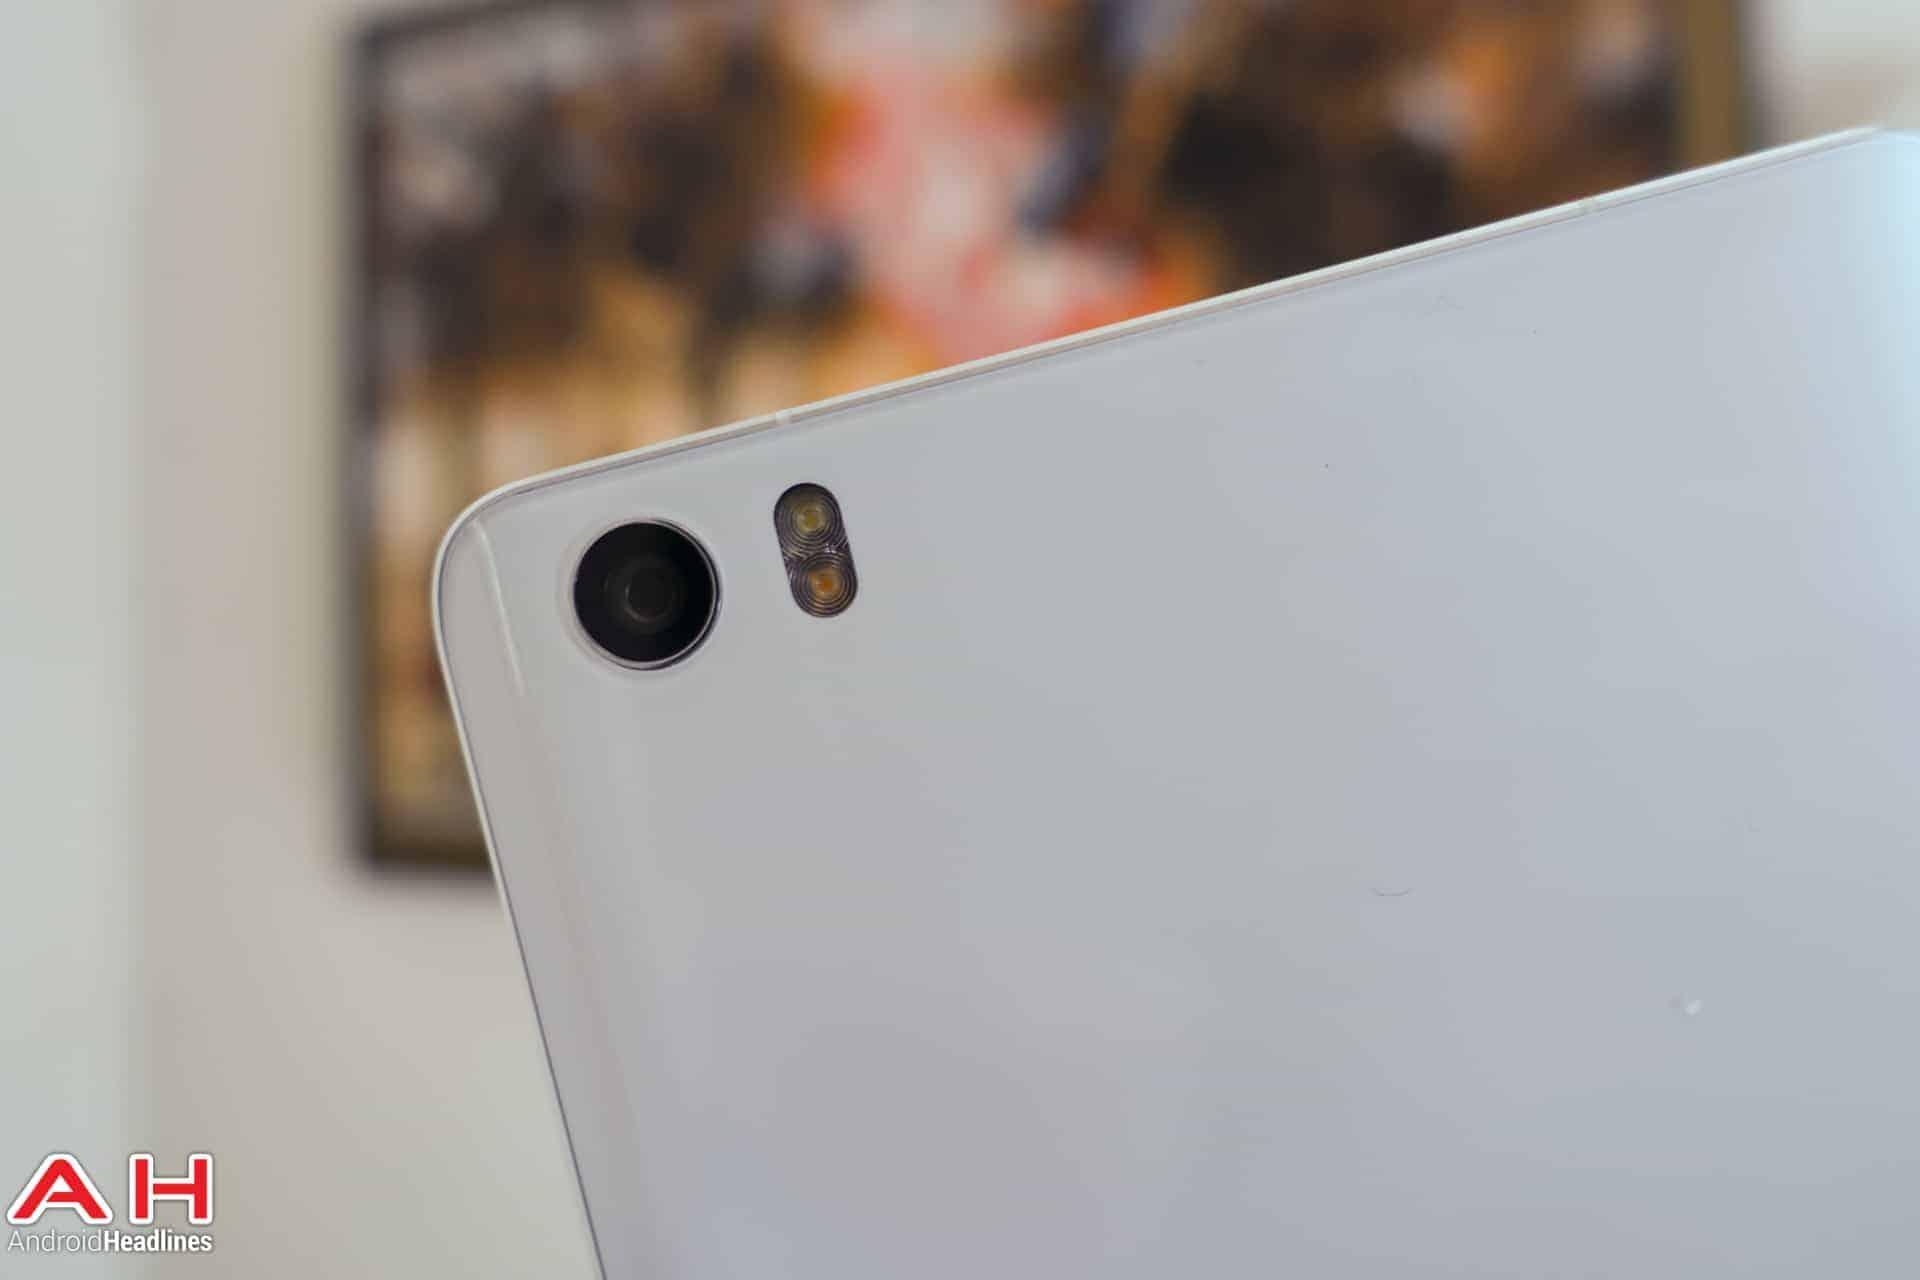 Xiaomi Mi Note AH 03784